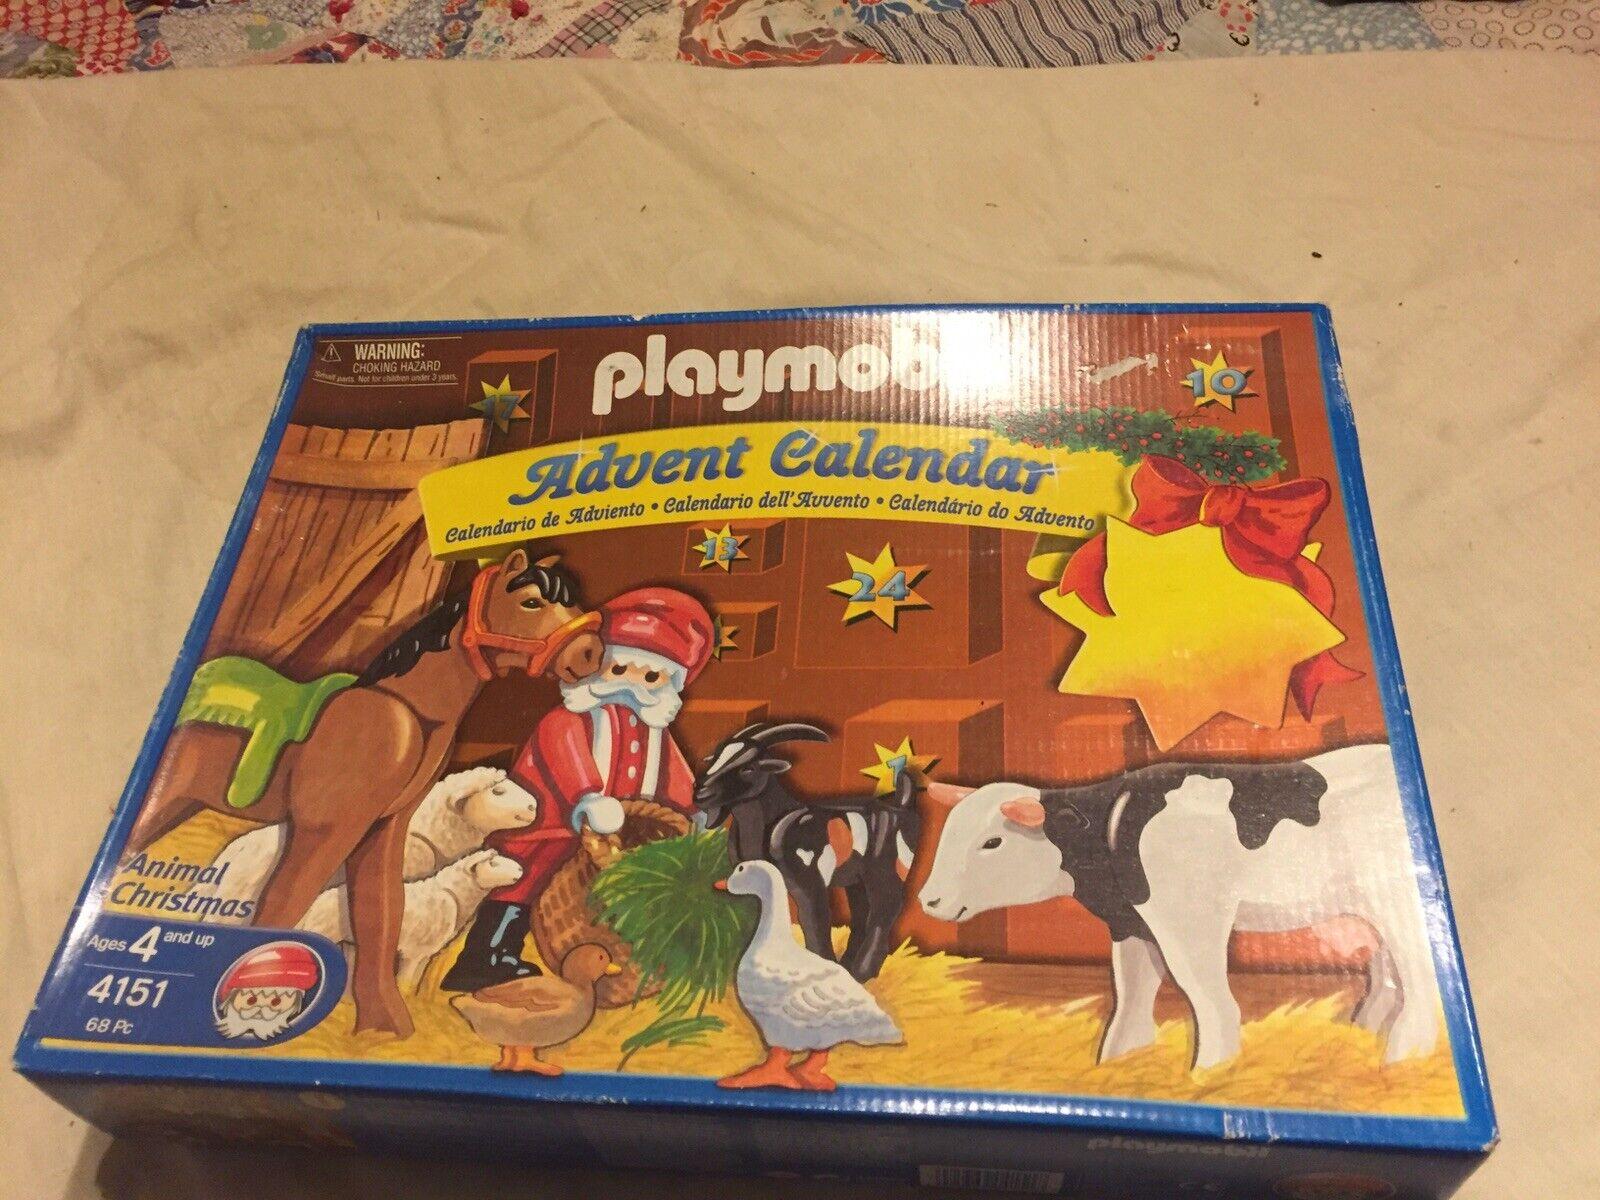 RARE 2004 Playmobil Advent Calendar Animal Christmas Set   4151 nuovo SEALED scatola  consegna veloce